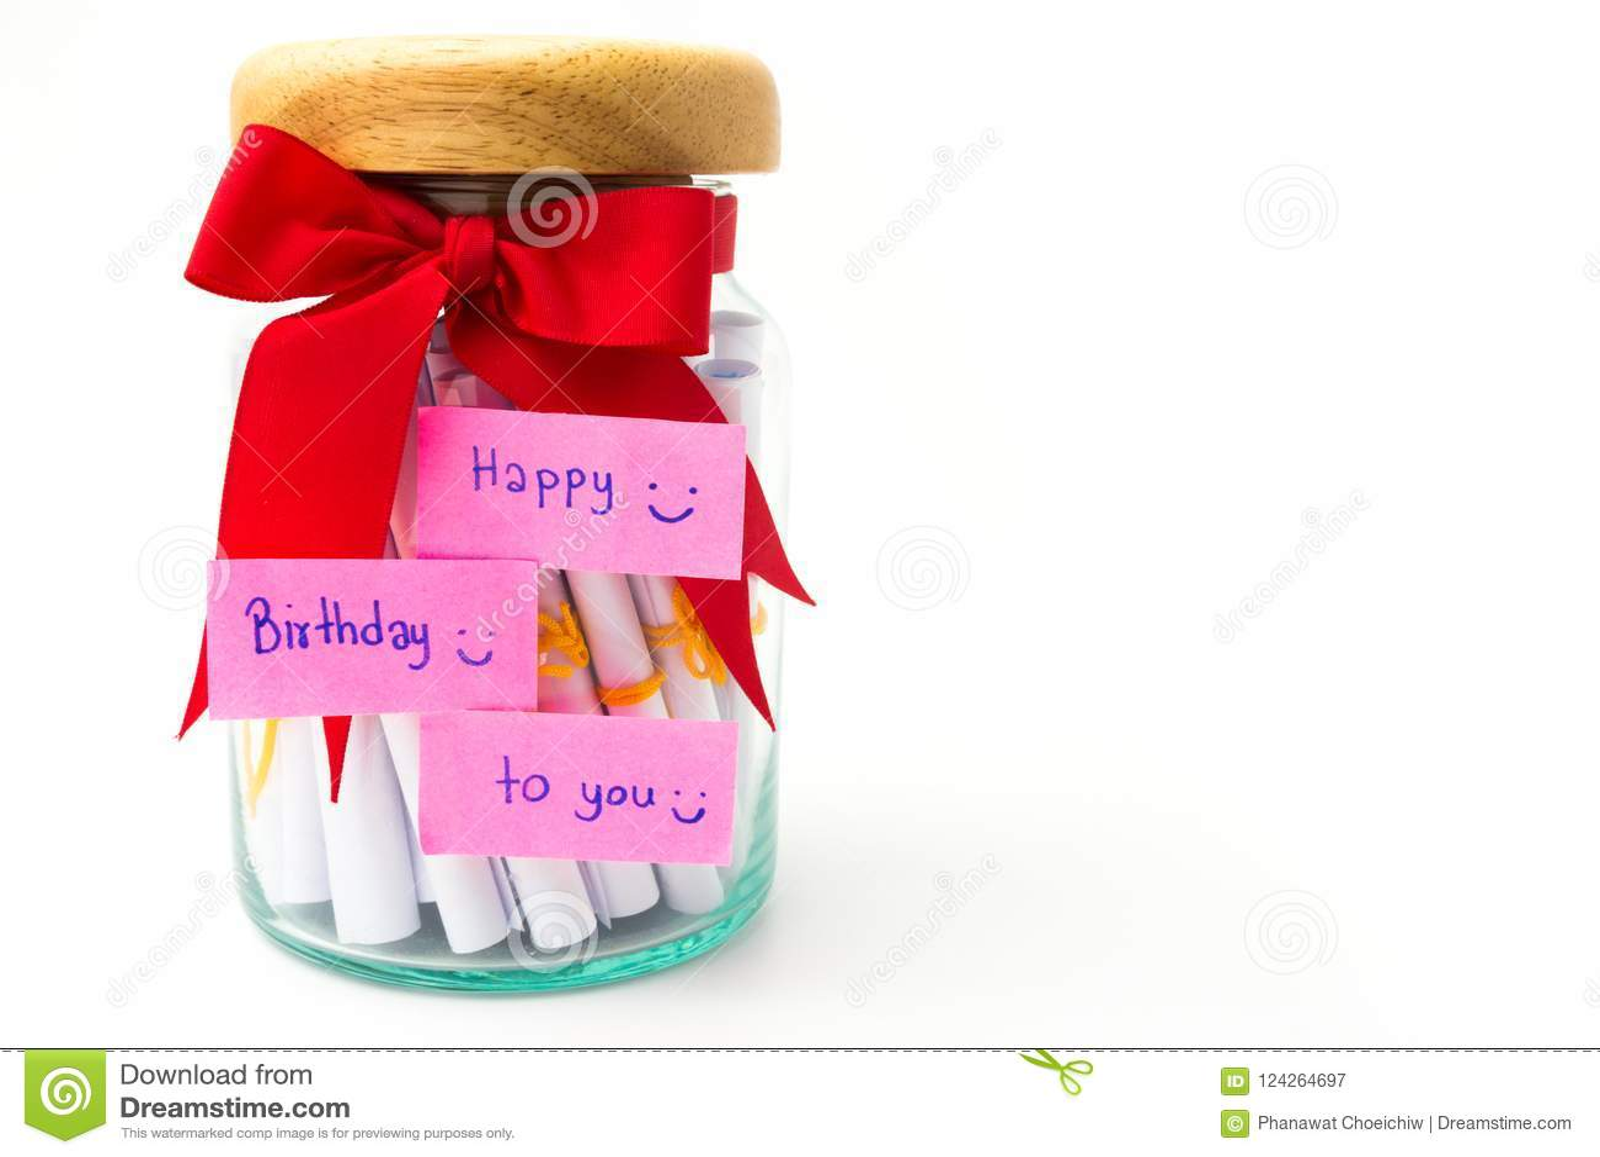 Handmade gift box in birthday isolate on white background.